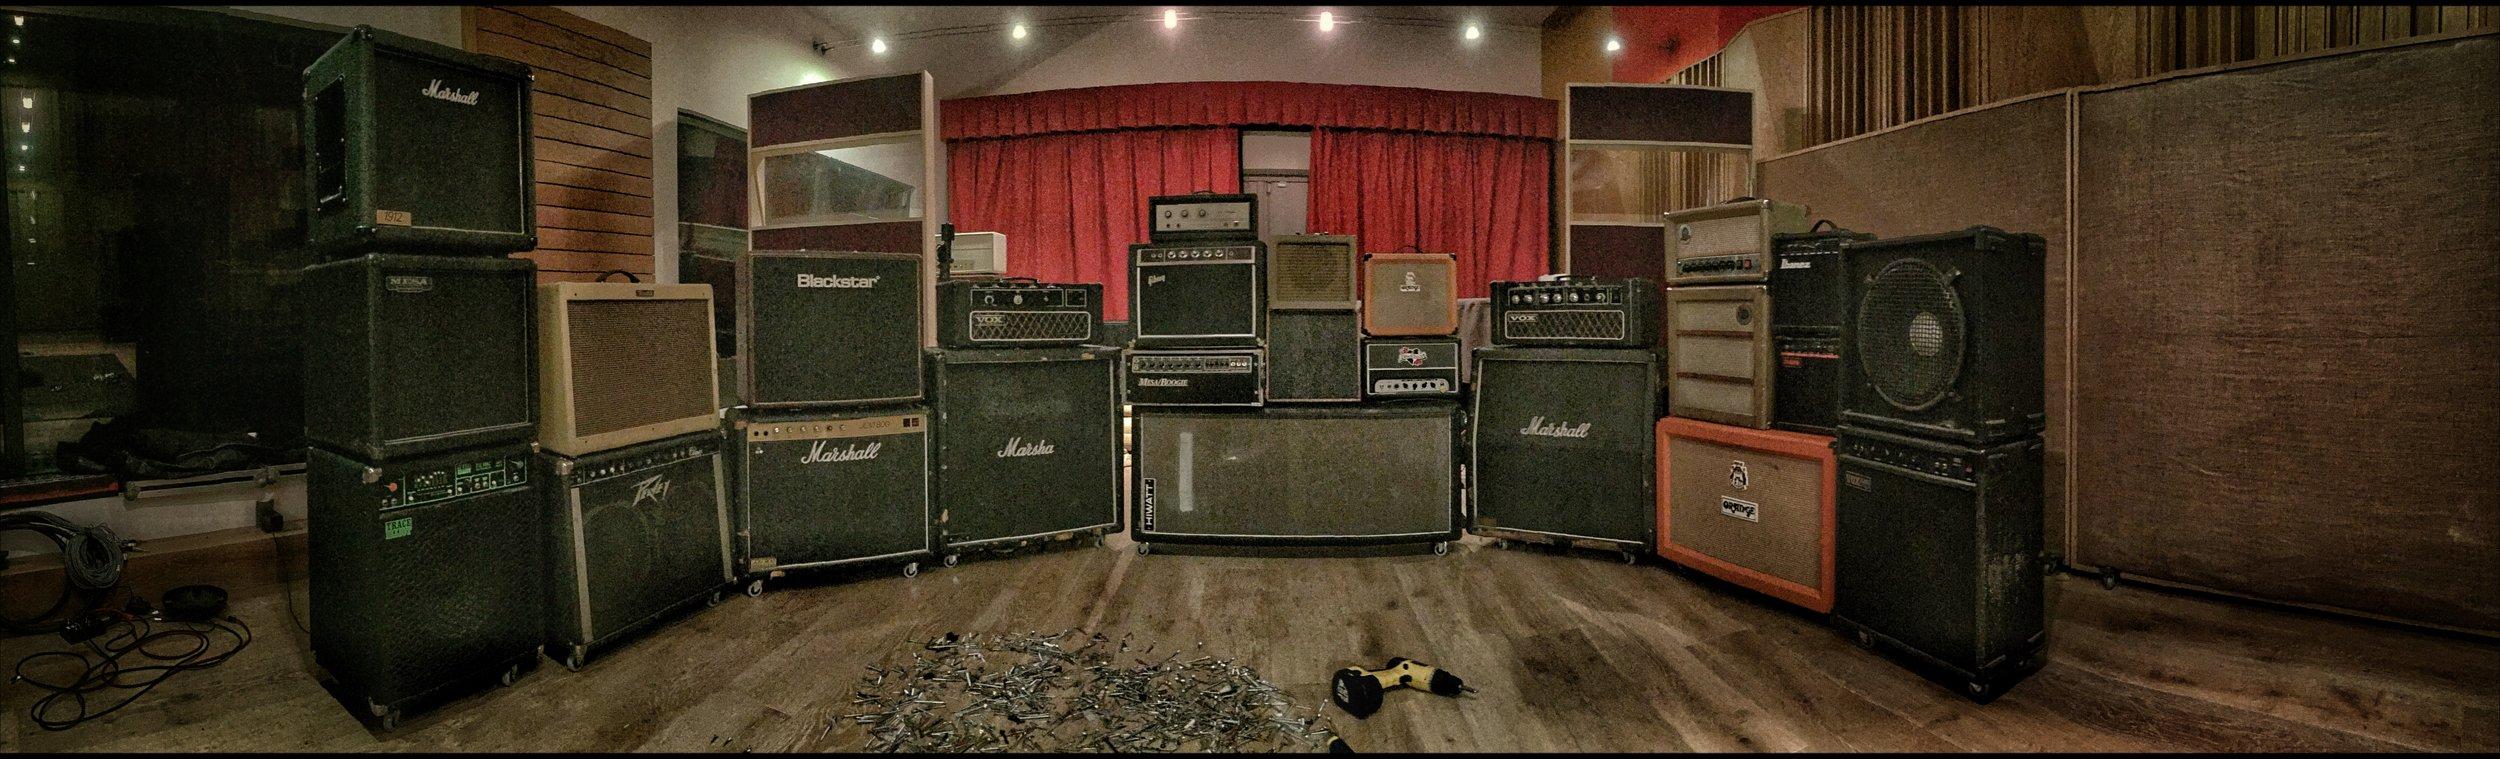 "Trace Elliot GP7 12"" Combo, Mesa 12"" Black Shadow Cab, Marshall 1912 12"" Cab, Peavy Classic 2x12"" Scorpion Cab, Fender Blues Deluxe G12 12"" Combo, Marshall JCM 800 2x12"" Combo, Blackstar Artisan 30 2x12"" Combo, Vox Super Foundation Bass Head Solid State, Marshall 1960 Straight 4x12"" Cab, Slvertone Bass 30 Head Solid State, Gibson G10 Solid State, Mesa Mark III, Rex/Valco 8"" Combo, Fane 10"" Ext Cab, Orange Crush 15R, Rhino Toy Amp, Ibanez Toy Amp, Blackheart Little Giant Head, Vox Conquer Solid State Head, Marshall 1960 Lead 4x12"" Cab, SJB Valve Special, SJB 12"" Cab, Orange 2x12"" Cab, Vox 15"" Ext Cab, Vox Venue Bass 100 15"" Combo"